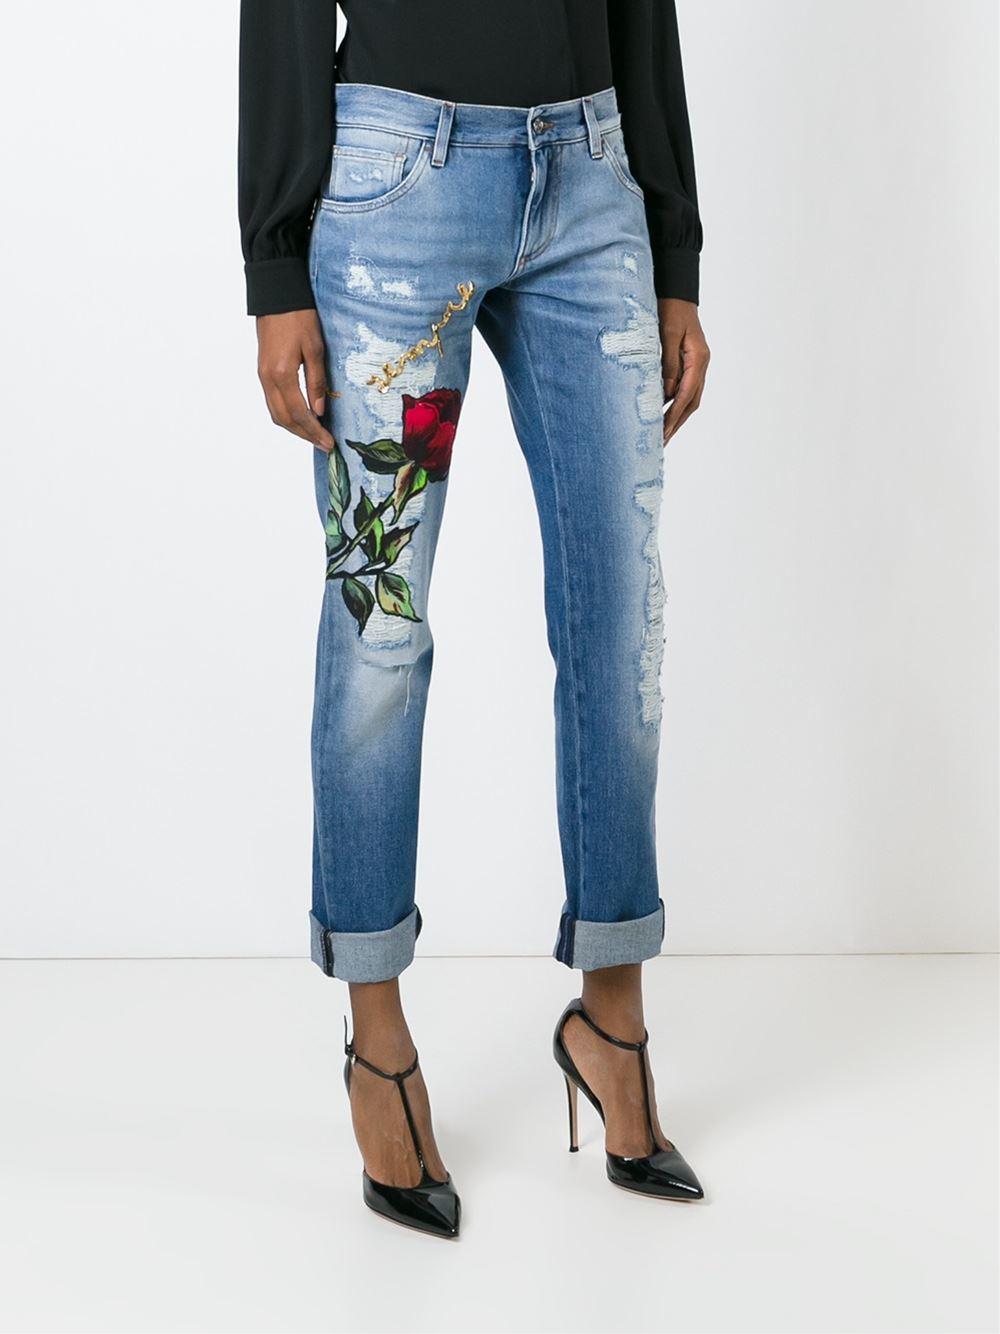 Dolce & gabbana Rose Patch Boyfriend Jeans in Blue | Lyst